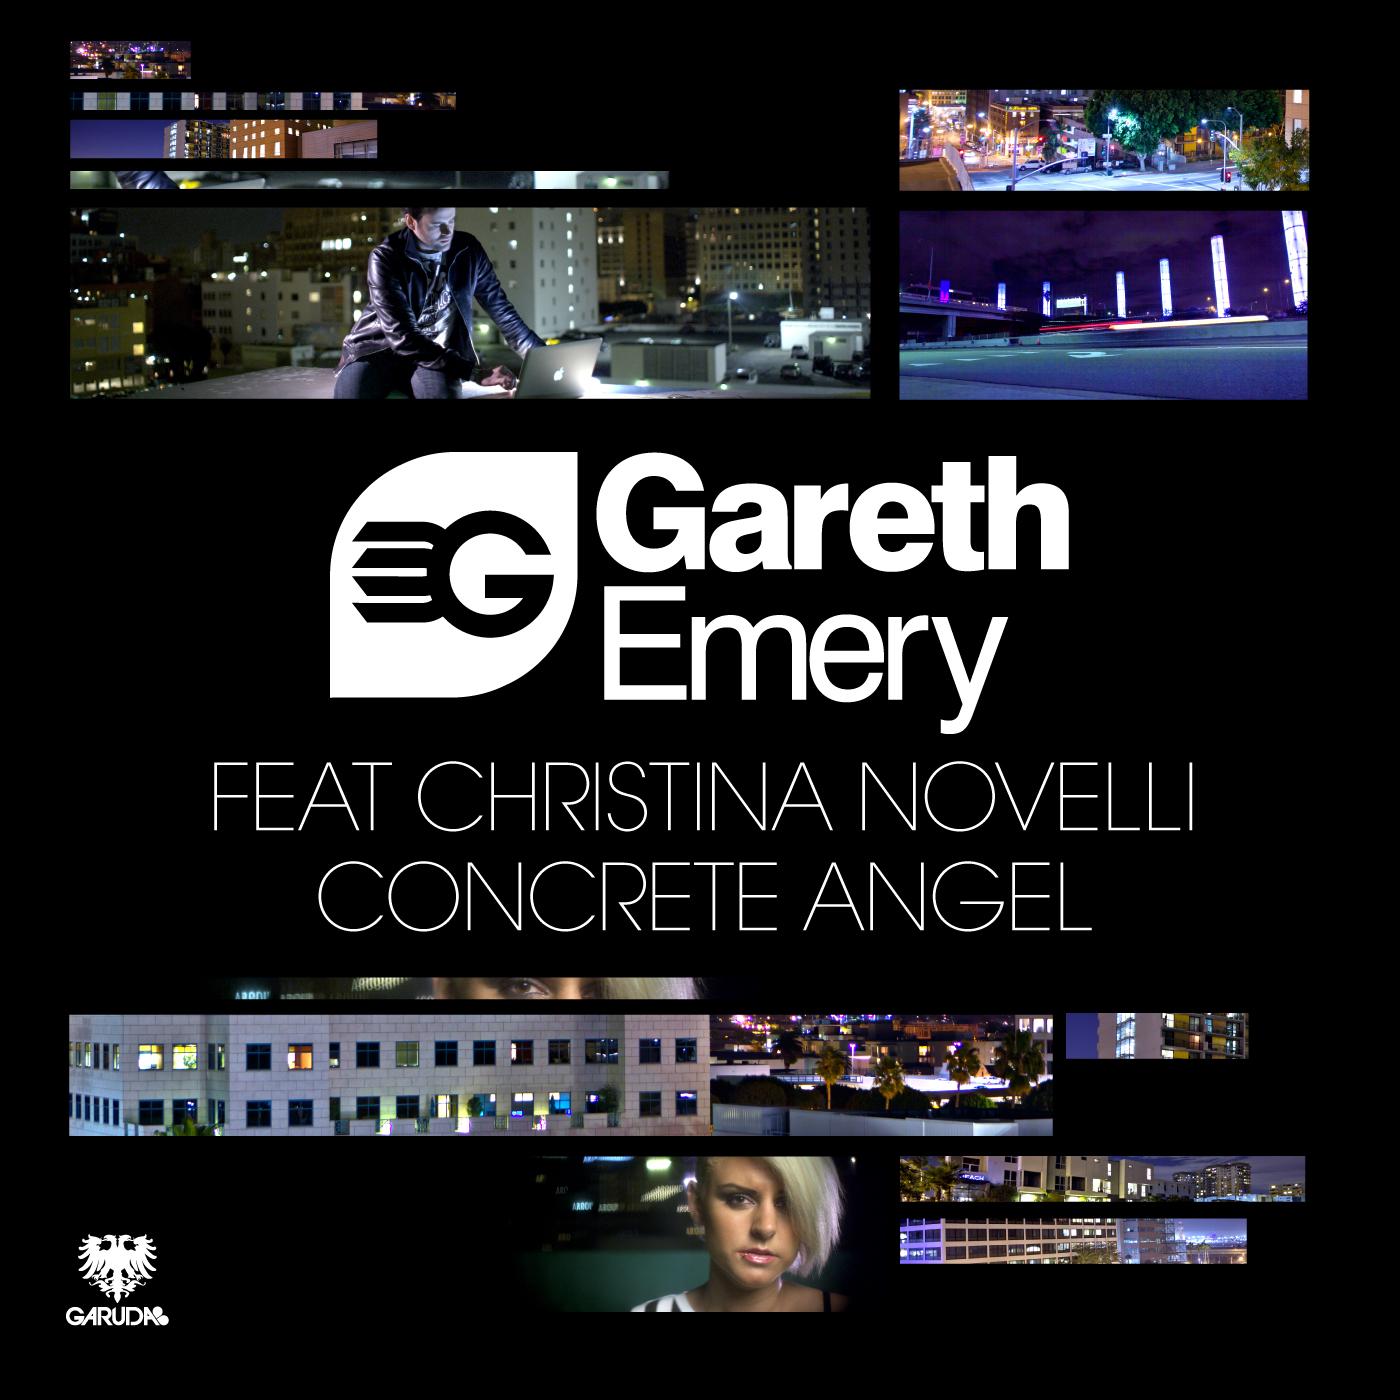 [10's] Christina Novelli - Concrete Angel (2012) Gareth%20Emery%20feat.%20Christina%20Novelli%20-%20Concrete%20Angel